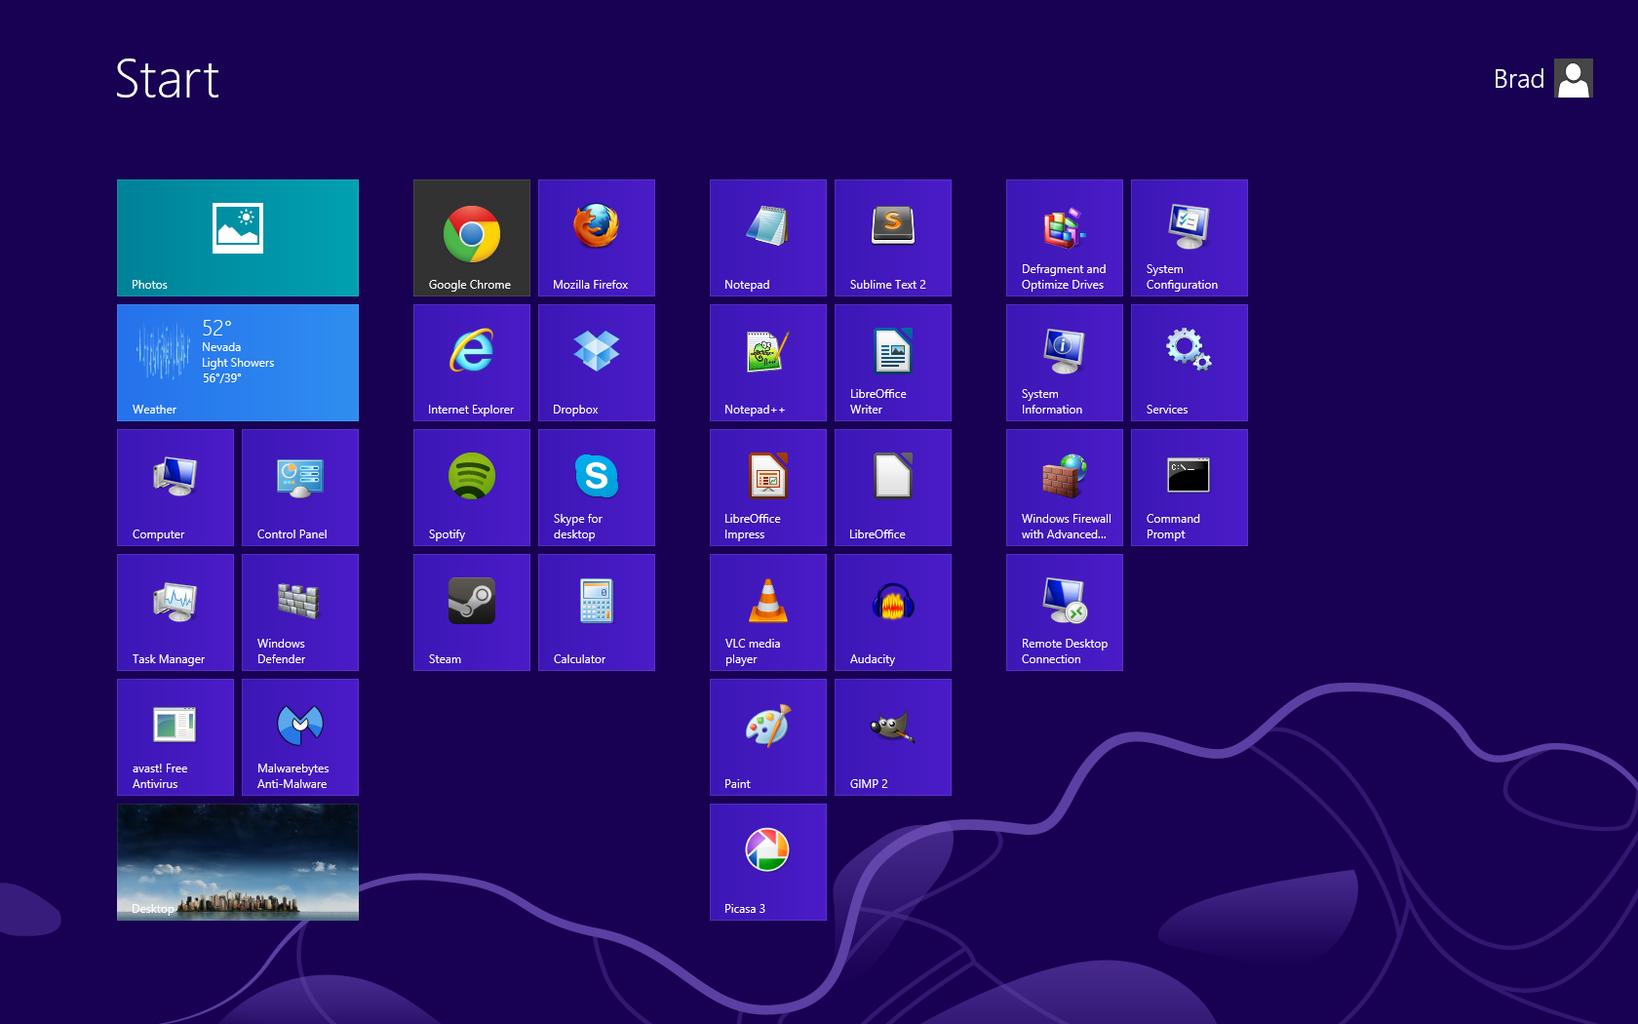 Understanding the Windows 8 Start Menu